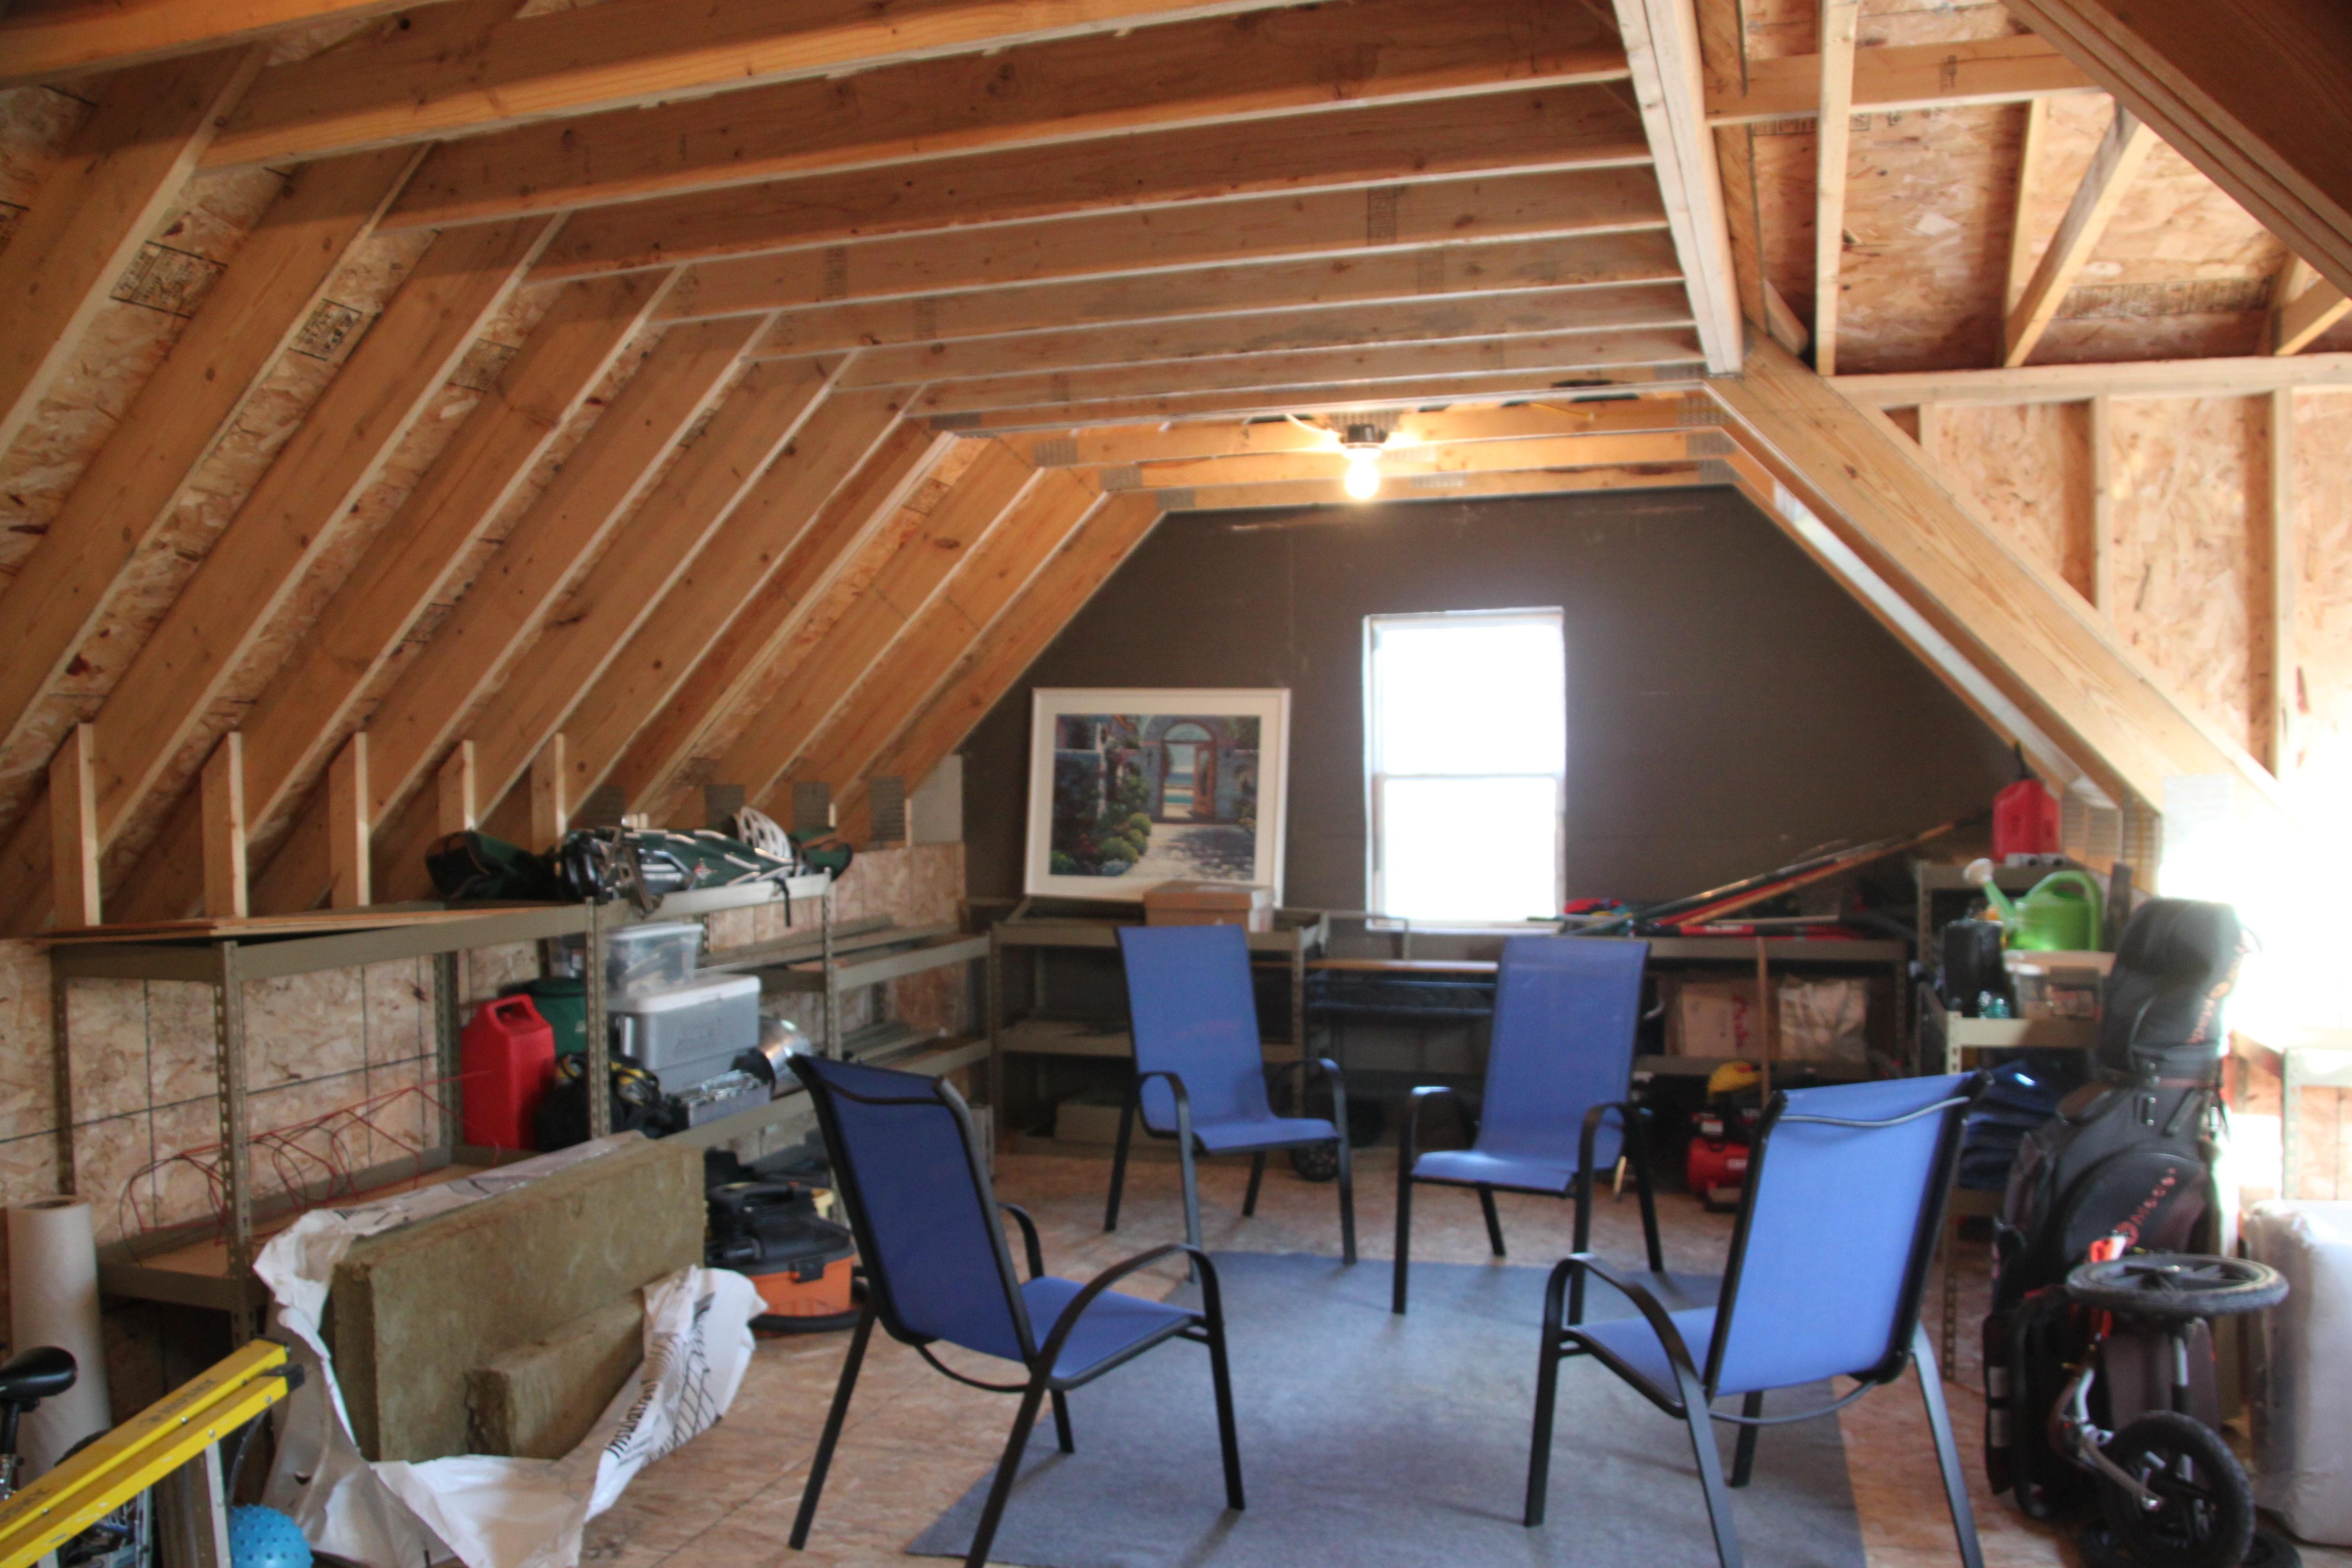 ... attic truss ... & 2 Car 2 Story Garage Using Attic Trusses and Dormer